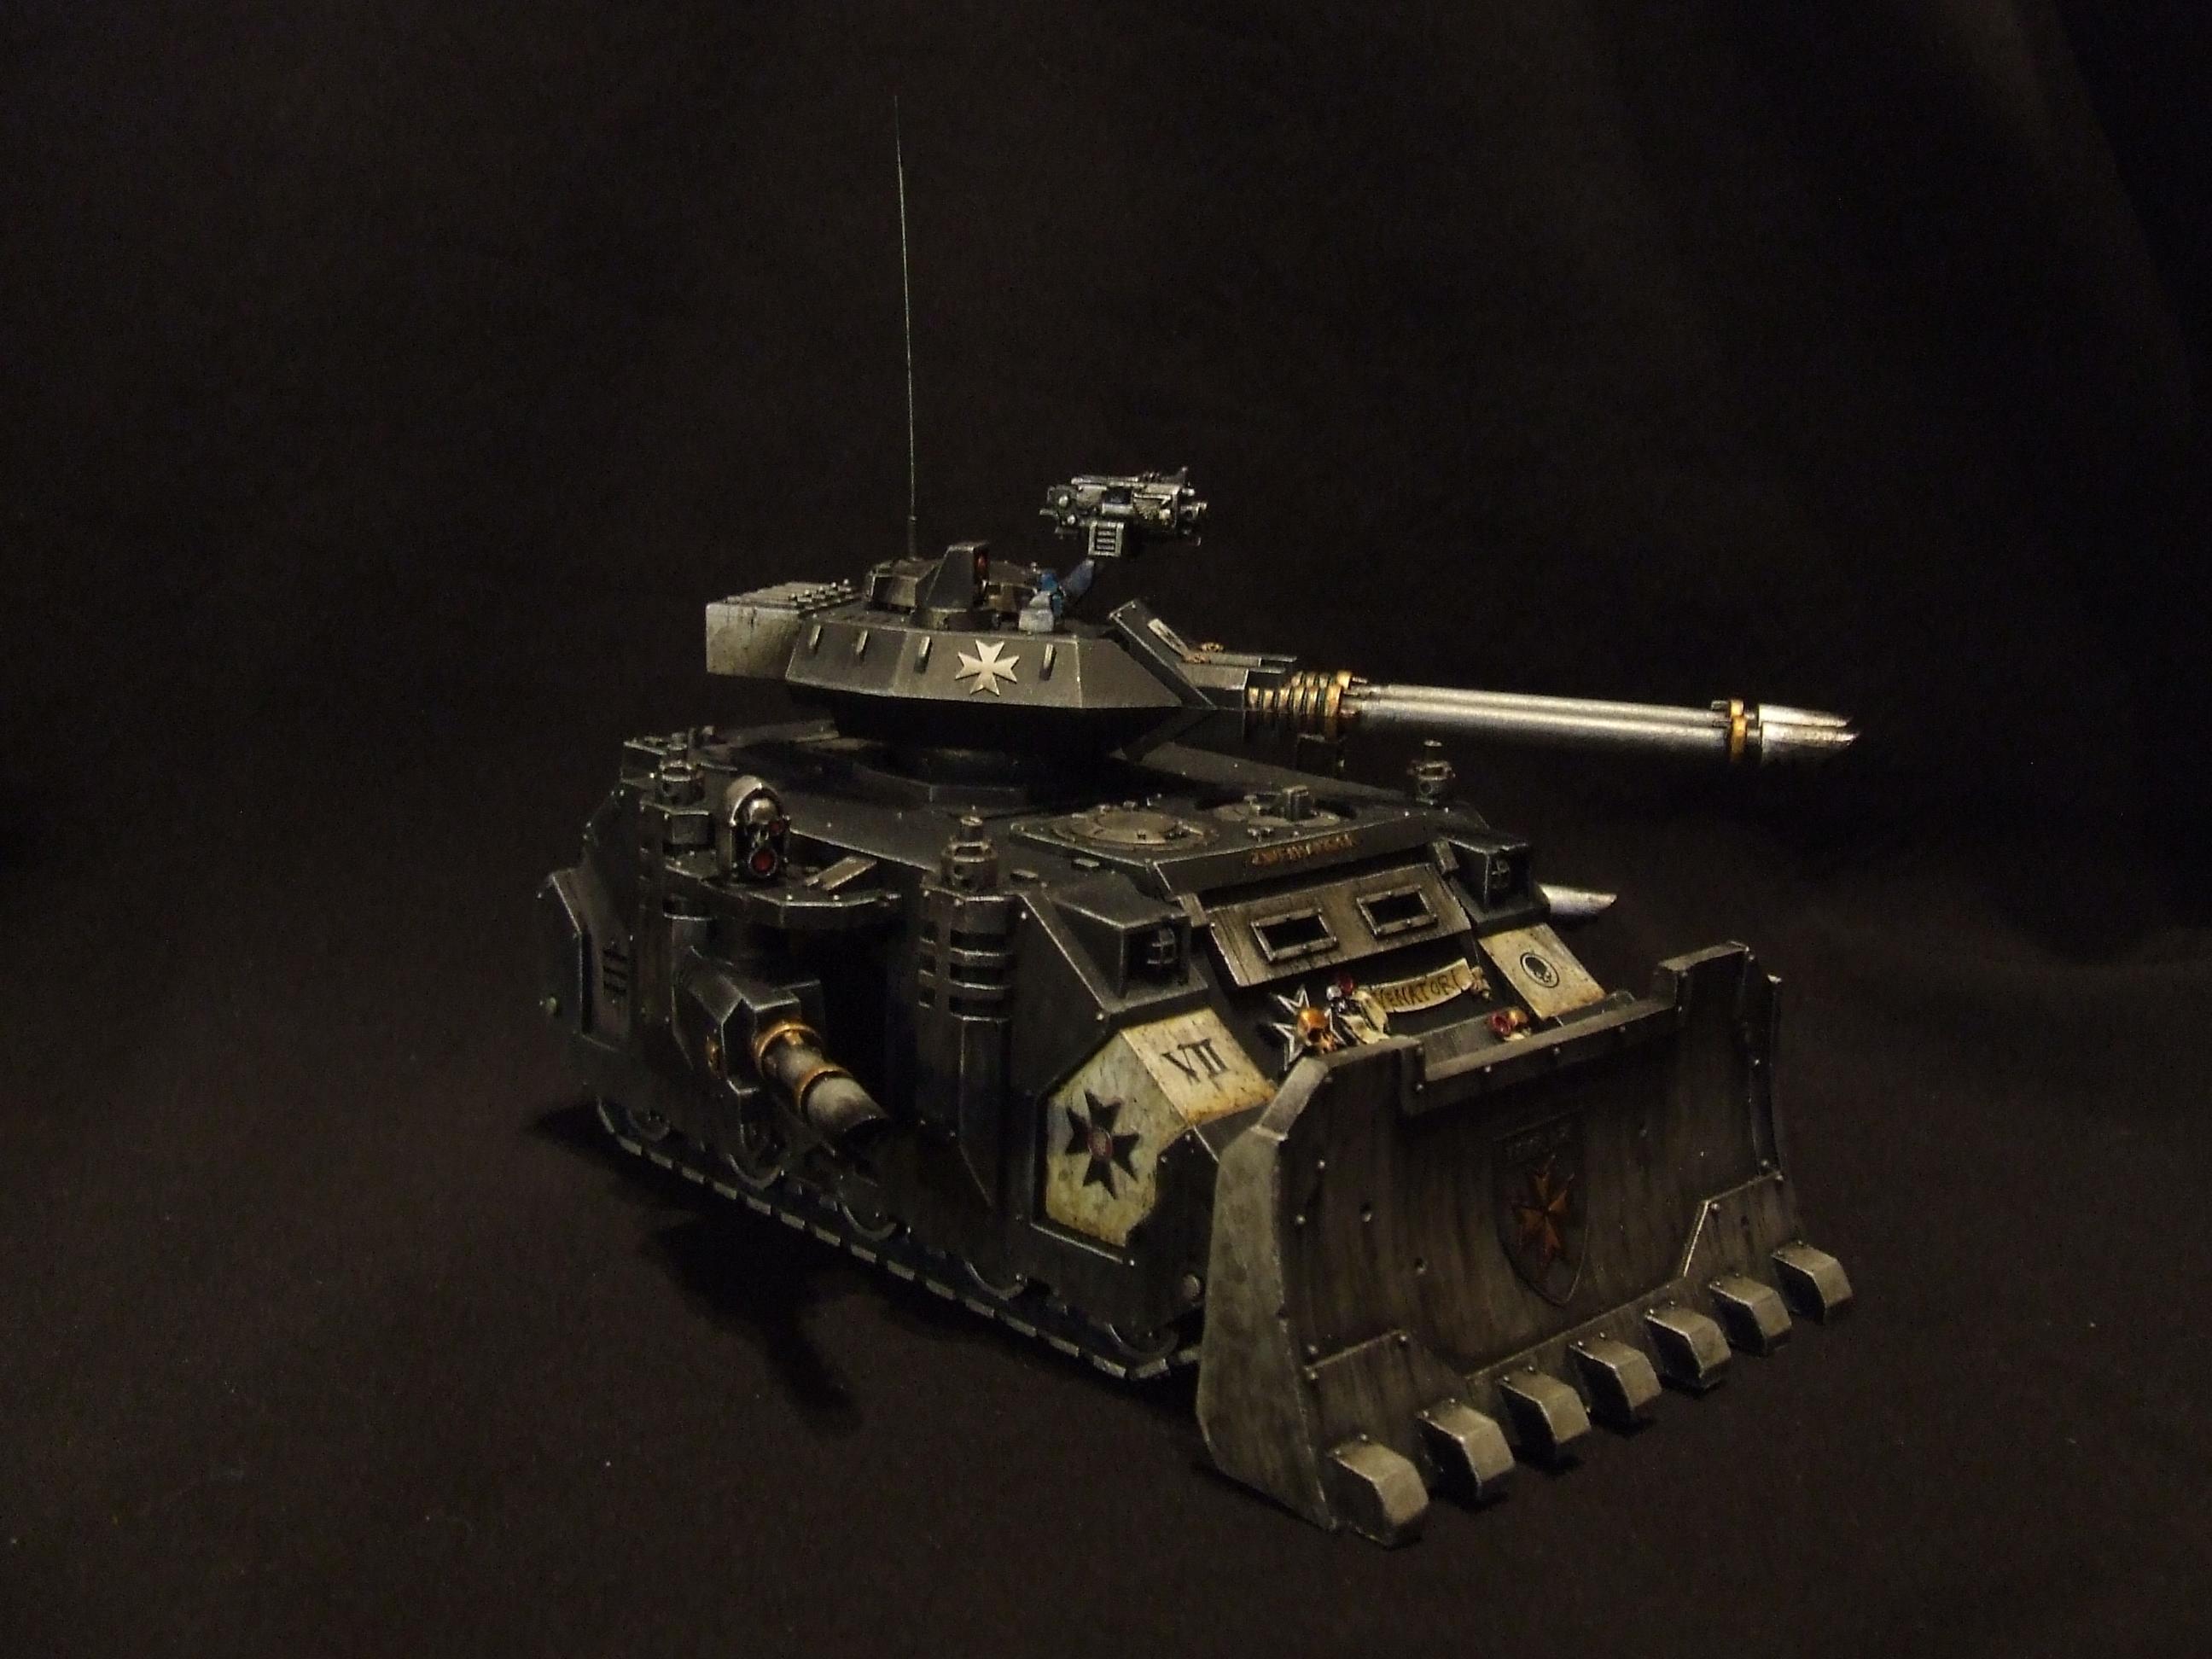 Black Templars 'Zweihander' Predator tankhunter.